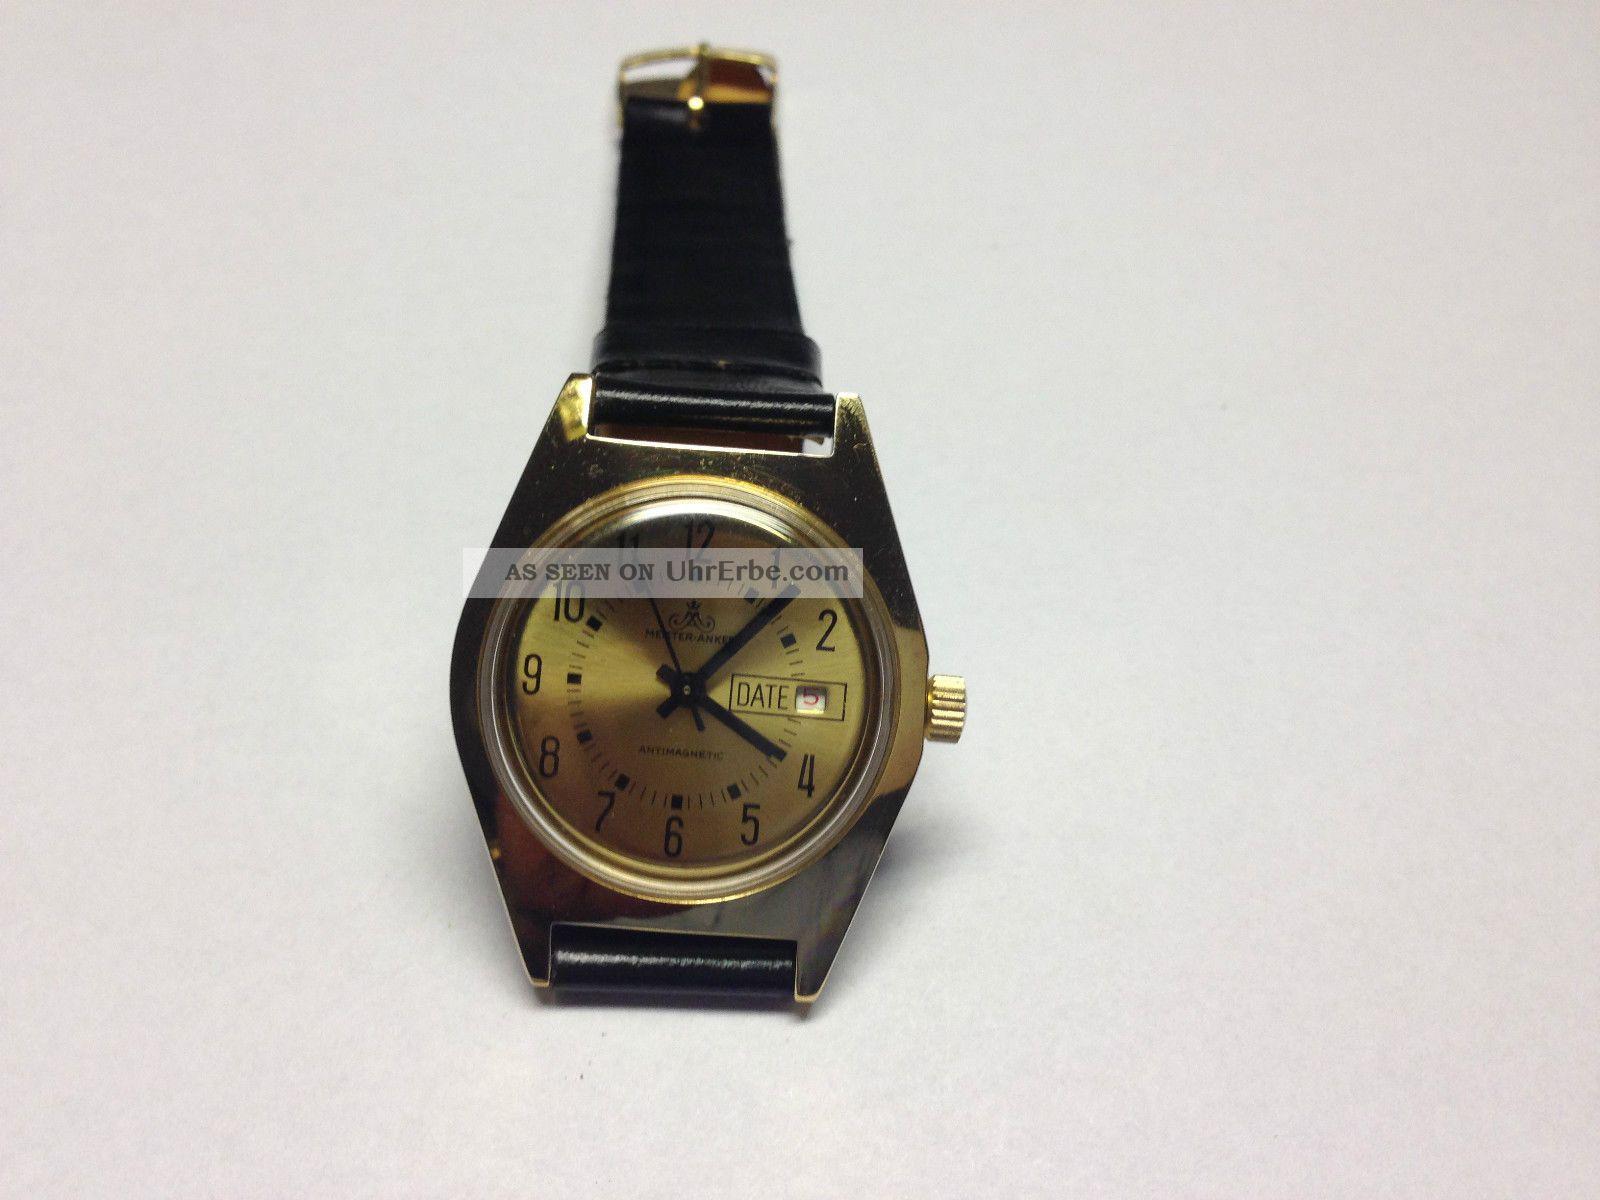 Meister Anker Herren Armband Uhr,  Handaufzug,  Top (1) Armbanduhren Bild